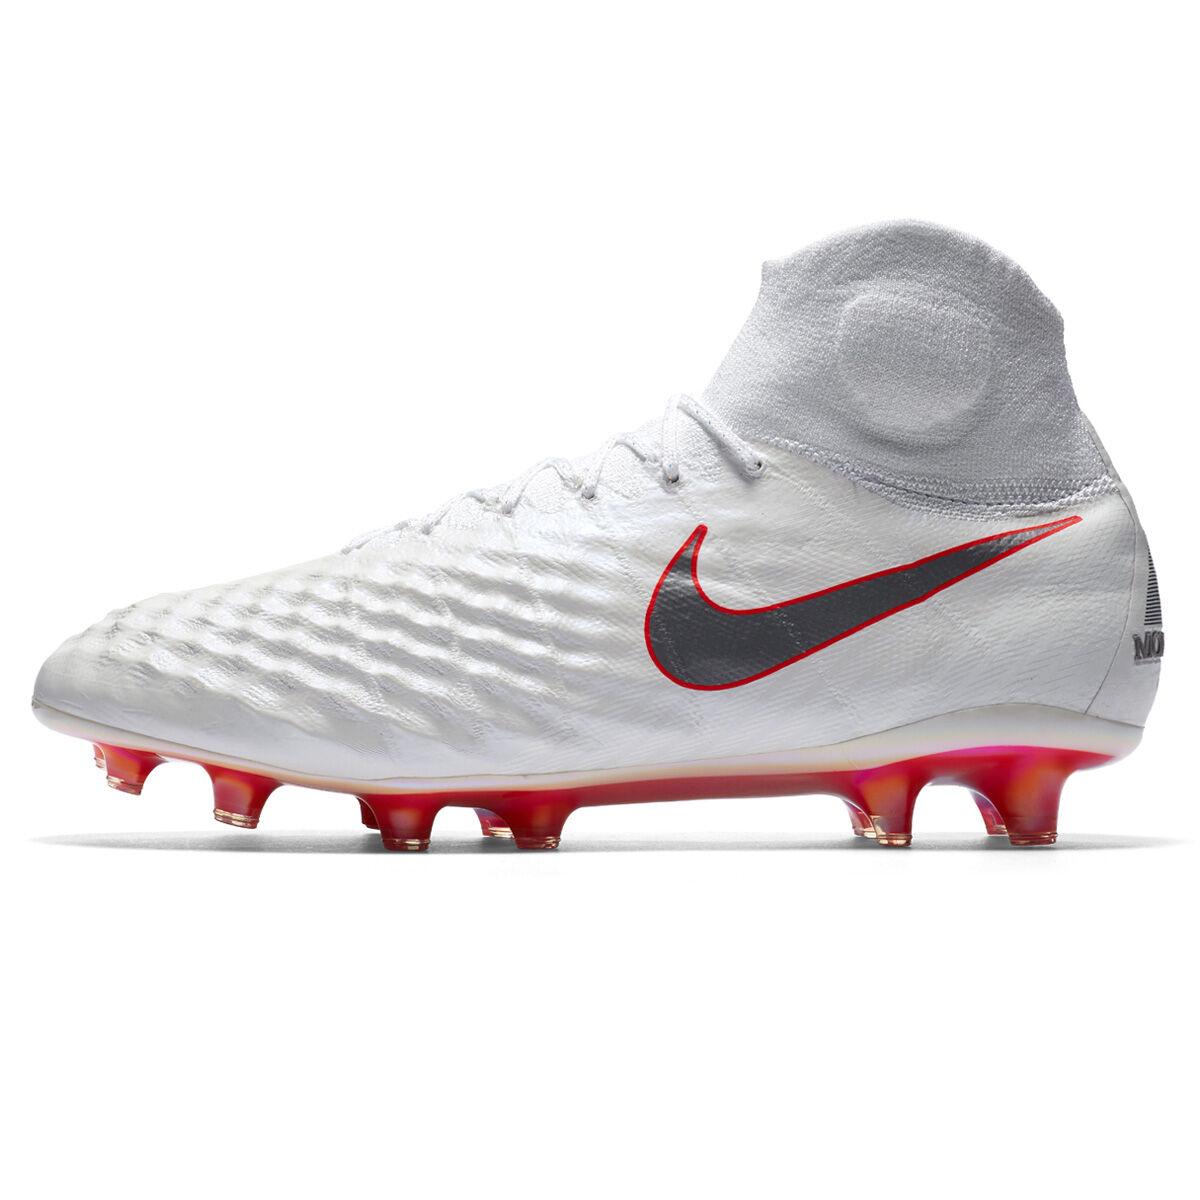 753708aad36 ... discount nike magista obra ii elite dynamic fit mens football boots  white grey us 7.5 61445